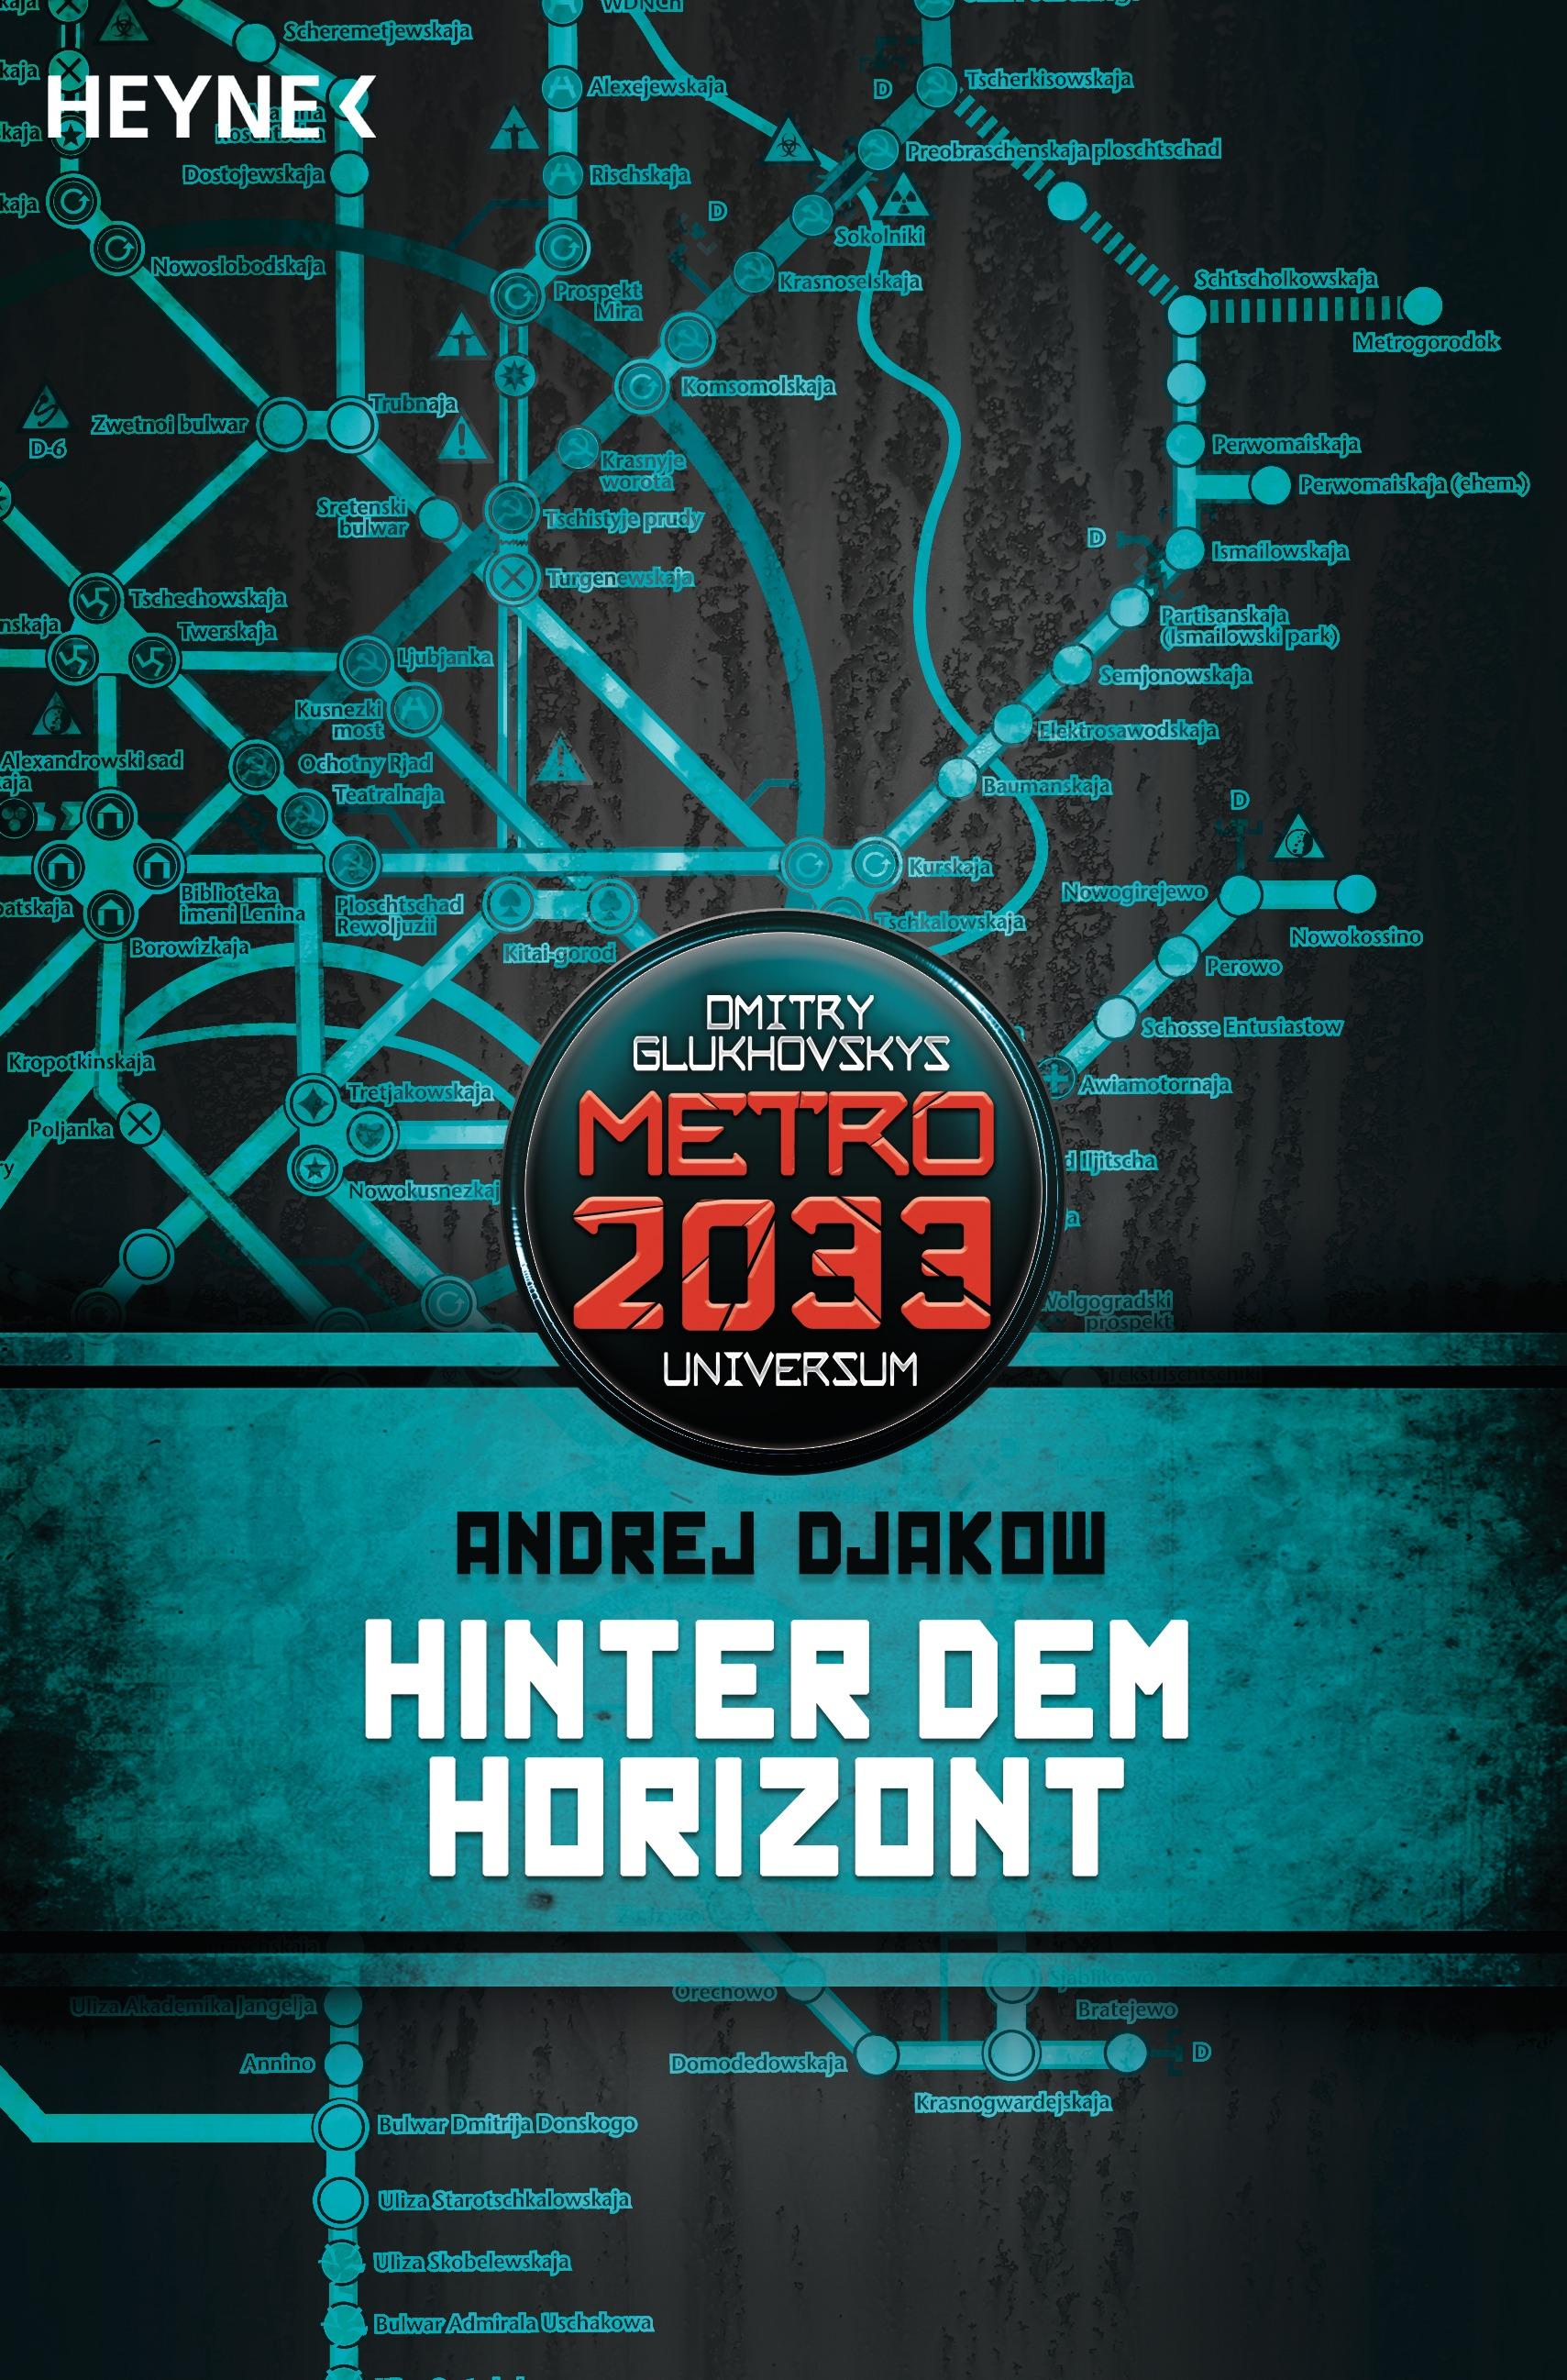 Metro 2033-Universum: Hinter dem Horizont - Andrej Djakow